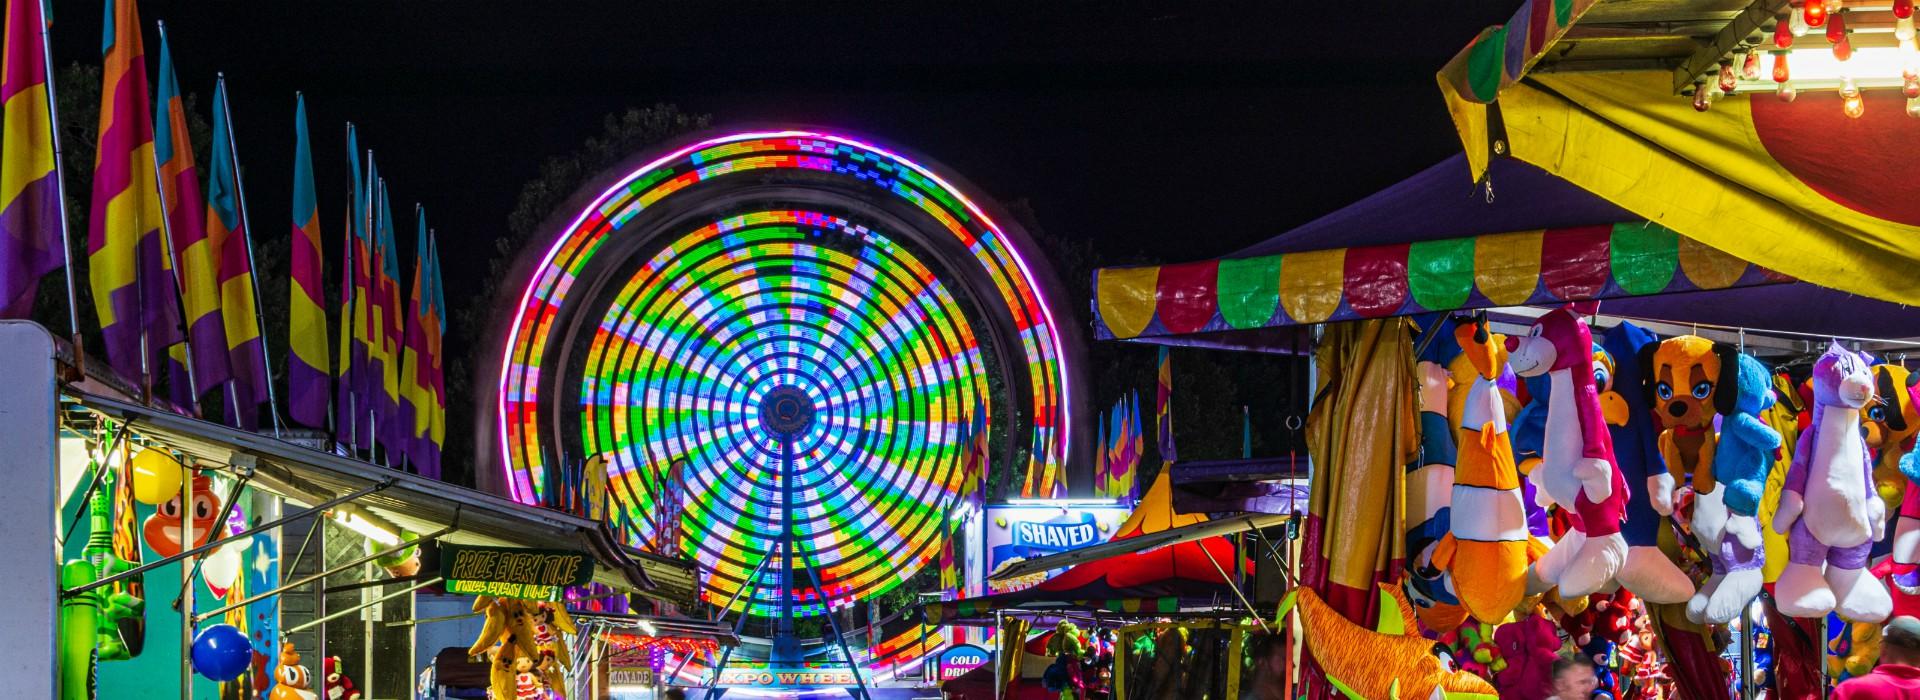 Night Time Ferris Wheel